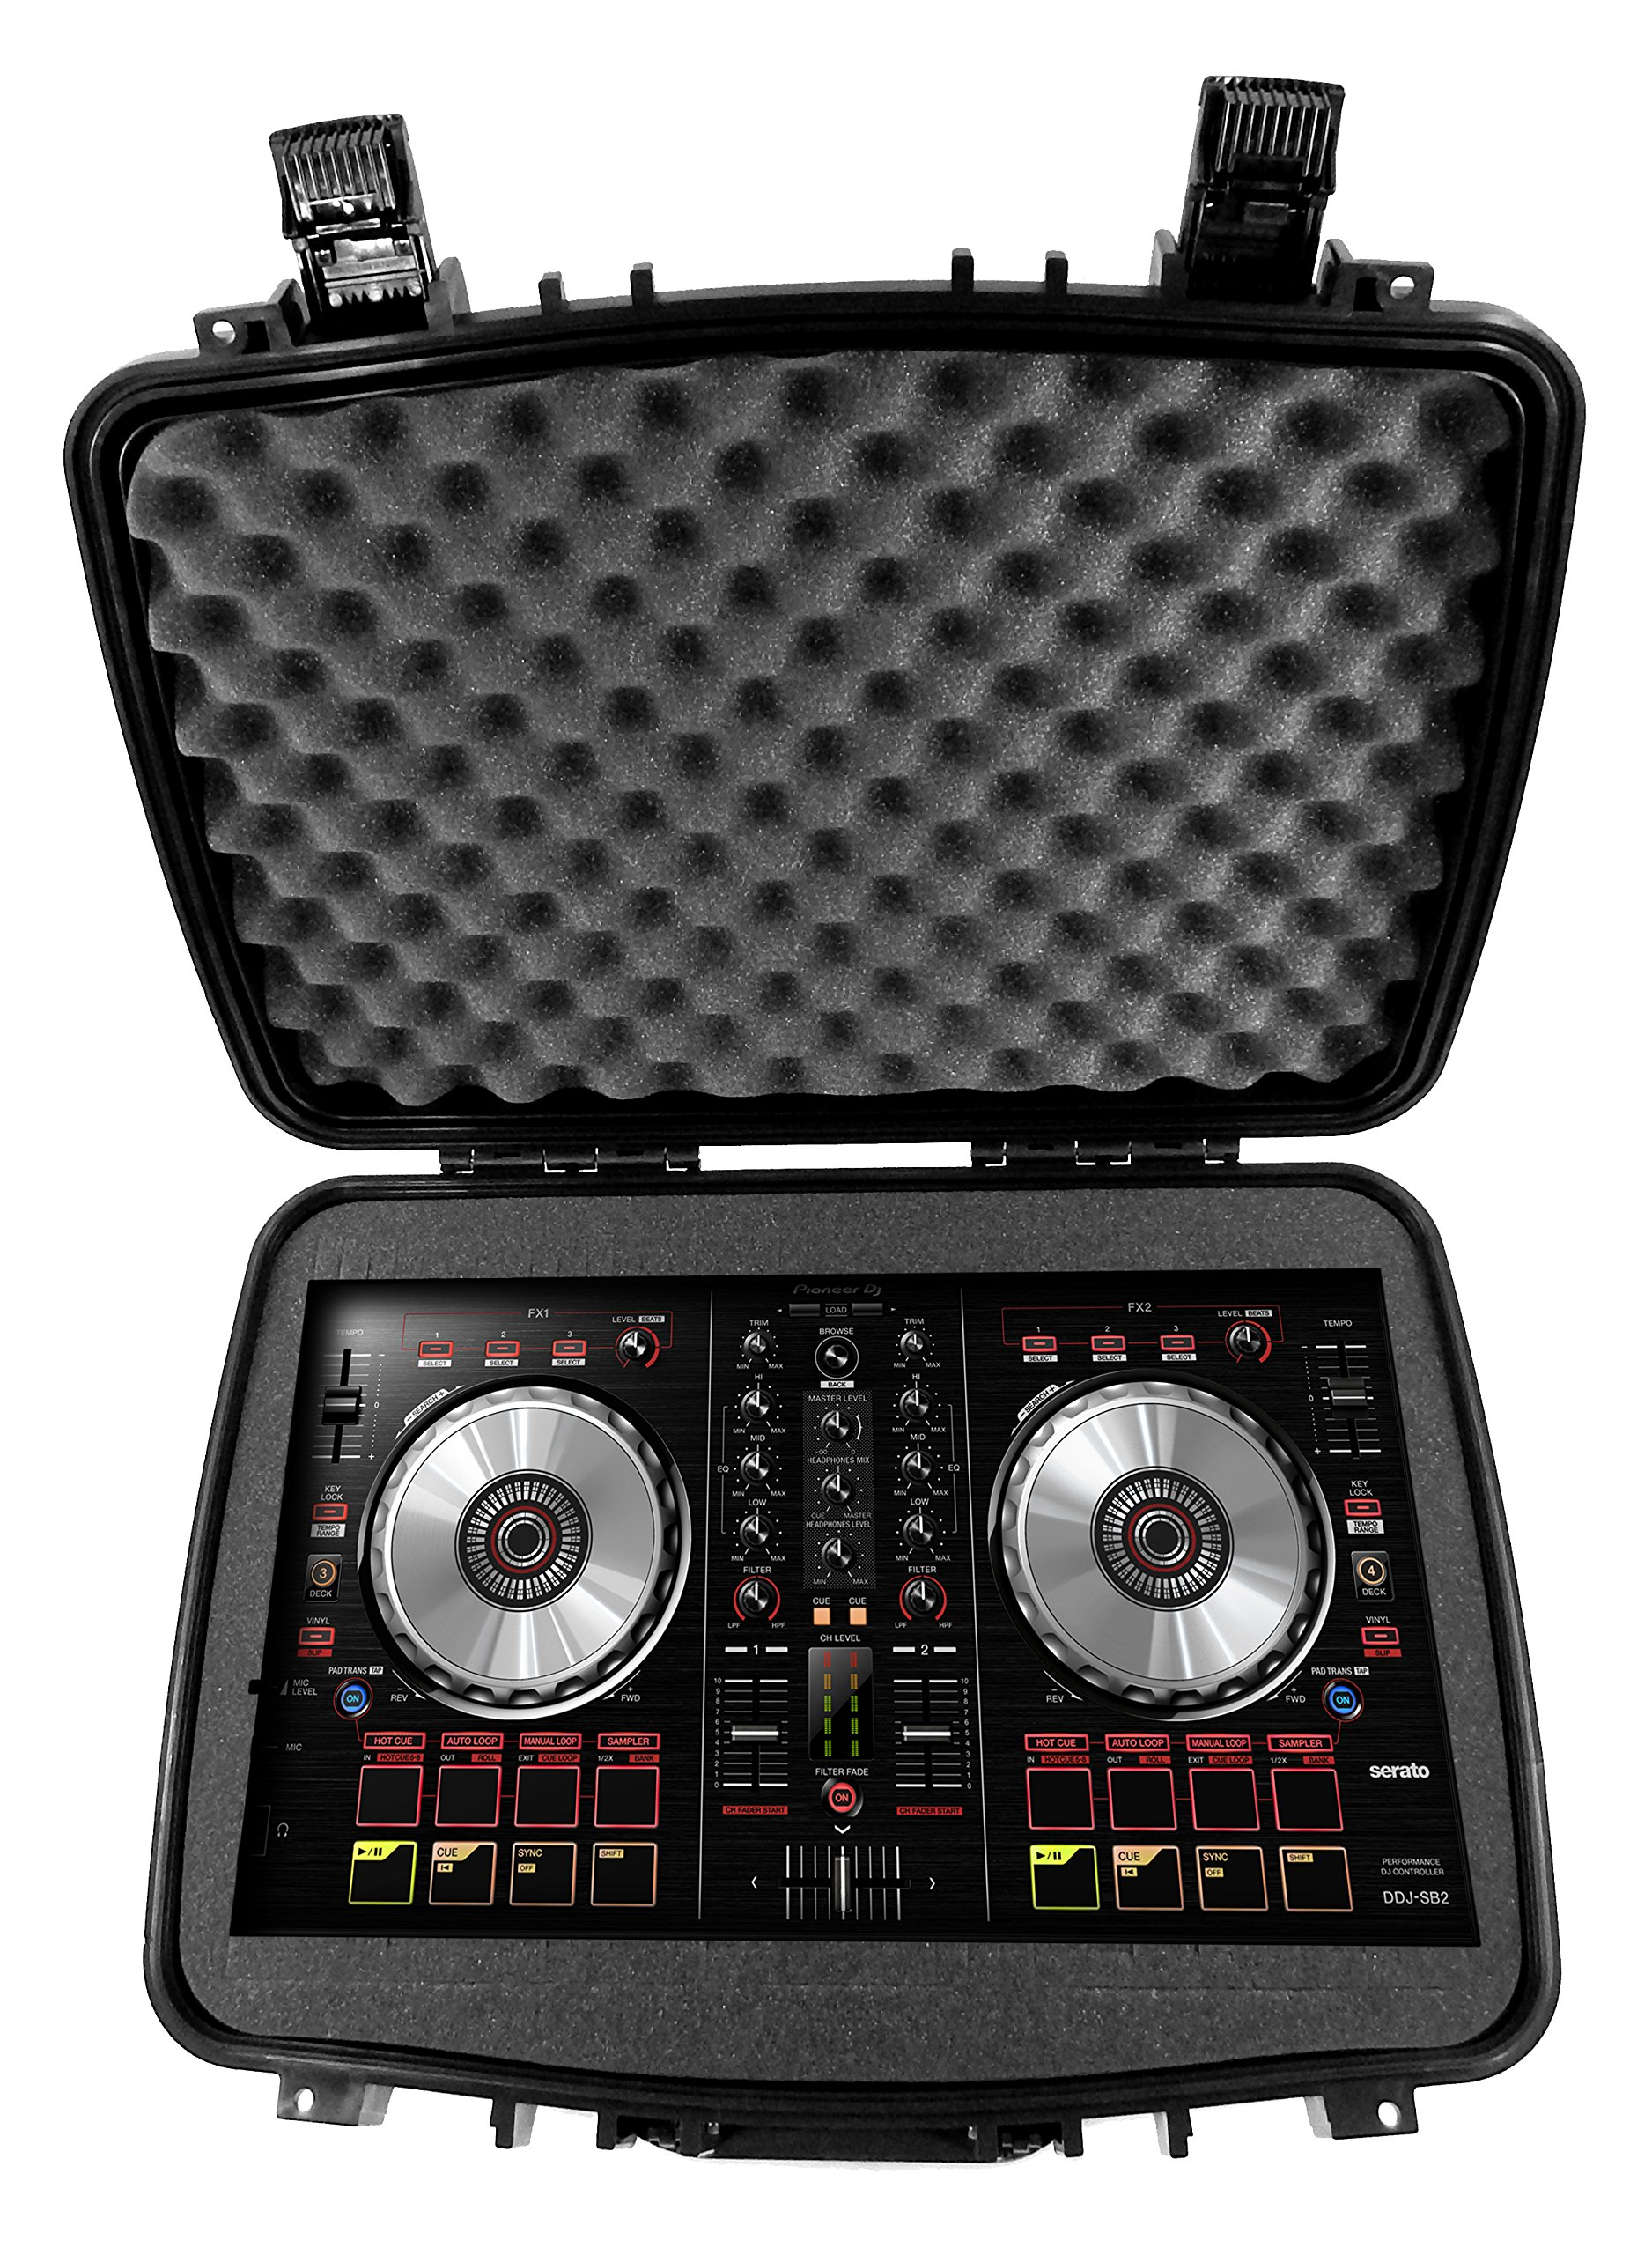 DJ Transporter Case 22'' for Mixer , Controller or Player - Fits Pioneer DDJ-RB / DDJ-SB2 / DDJ-WeGO3-W / DDJ-WeGO4-K / CDJ-2000NXS2 / CDJ-900NXS / XDJ-1000 / XDJ-1000MK2 / XDJ-700 / DJM-S9 DJM-450 350